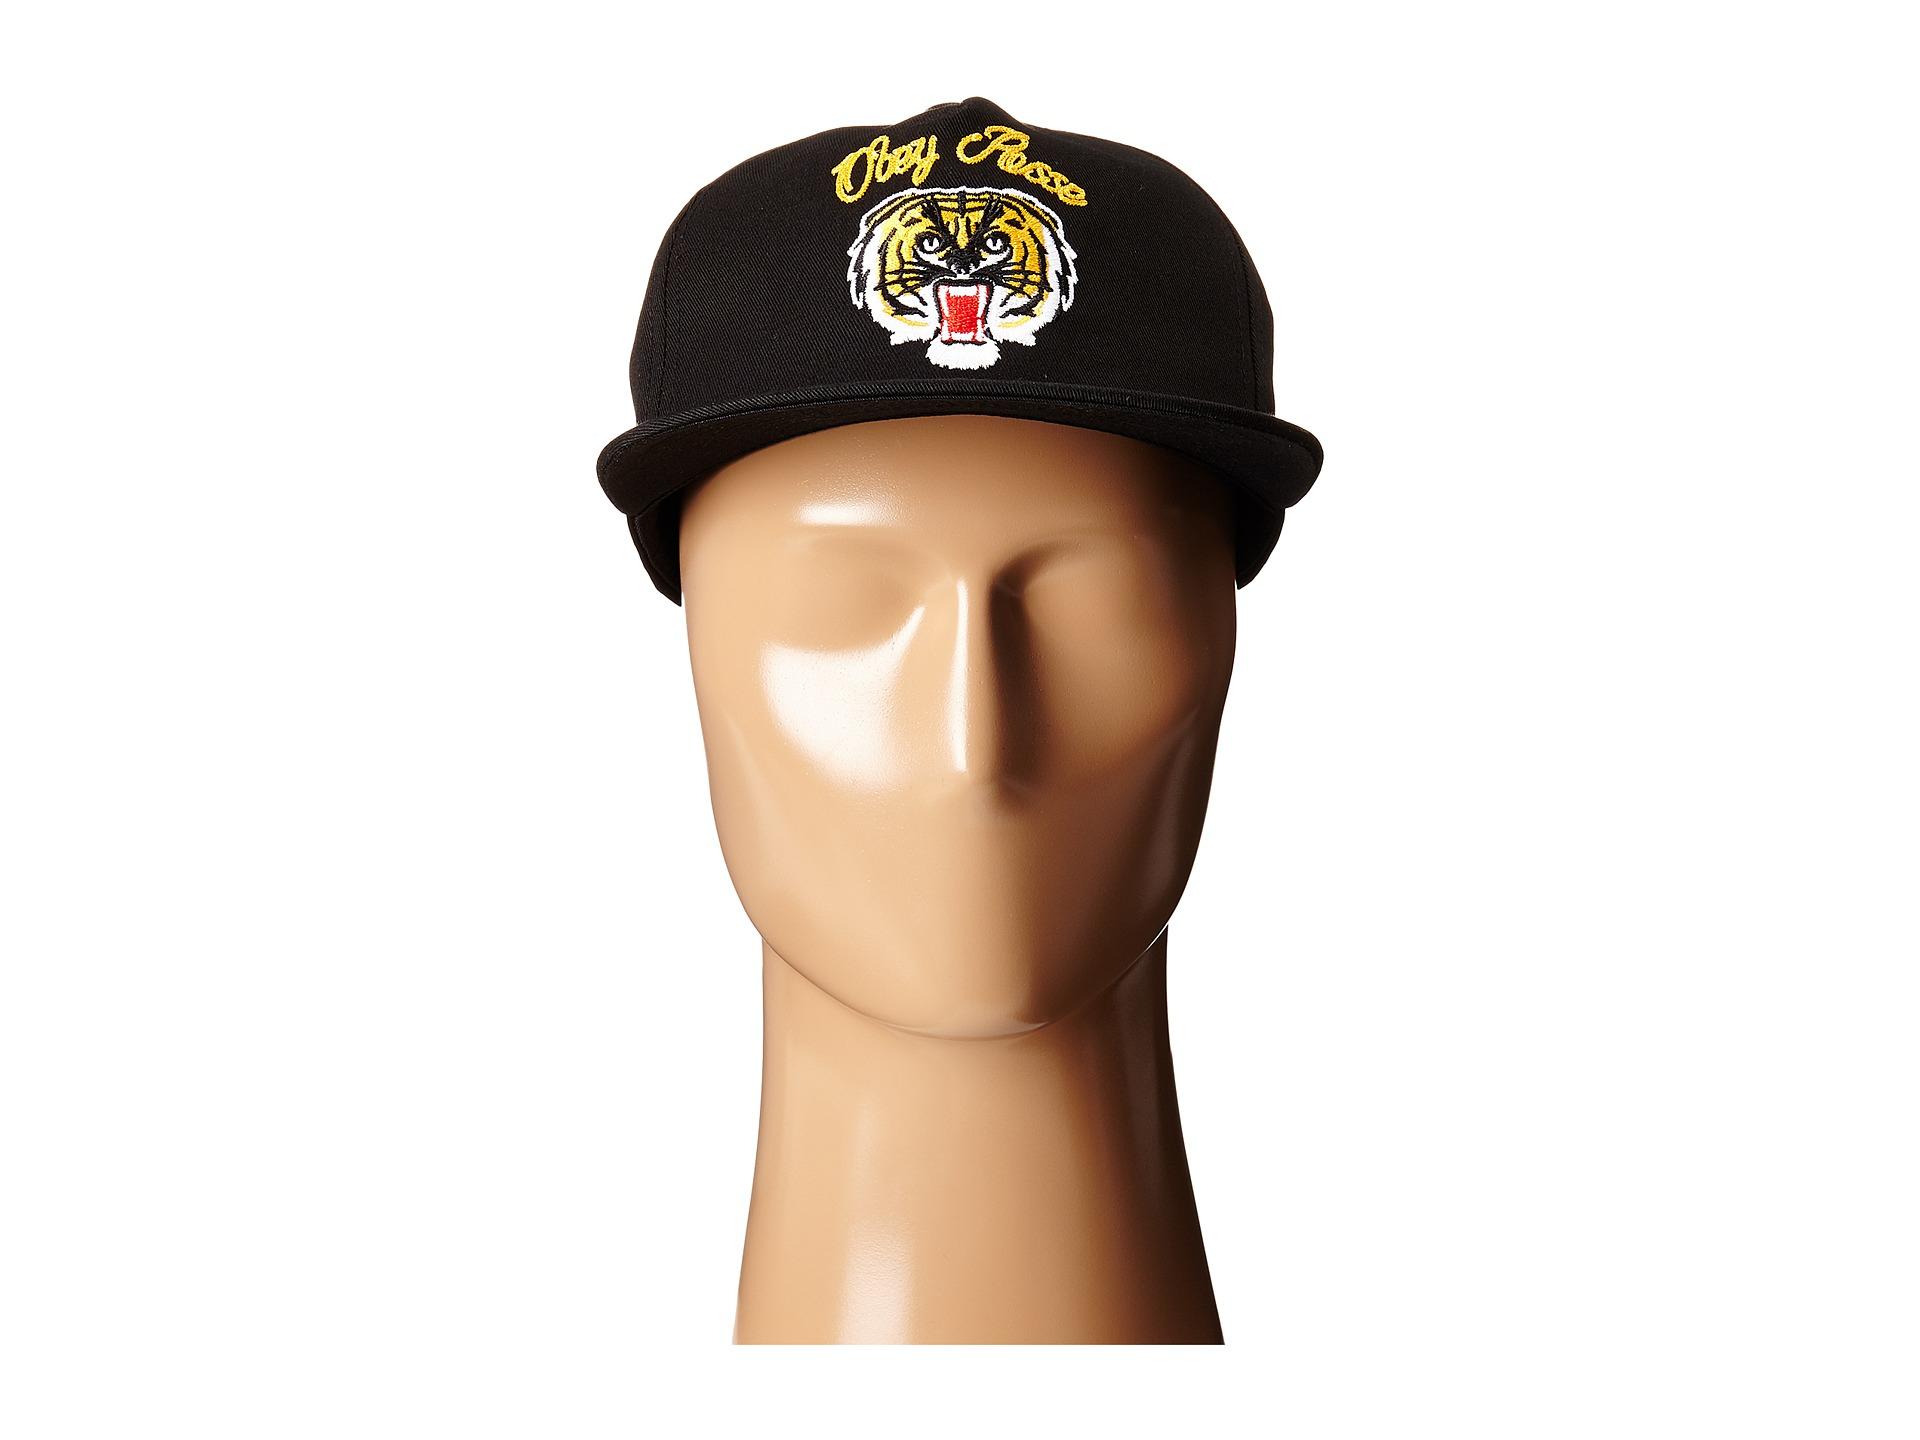 52e9b4ca18b Lyst - Obey Tiger Snapback in Black for Men